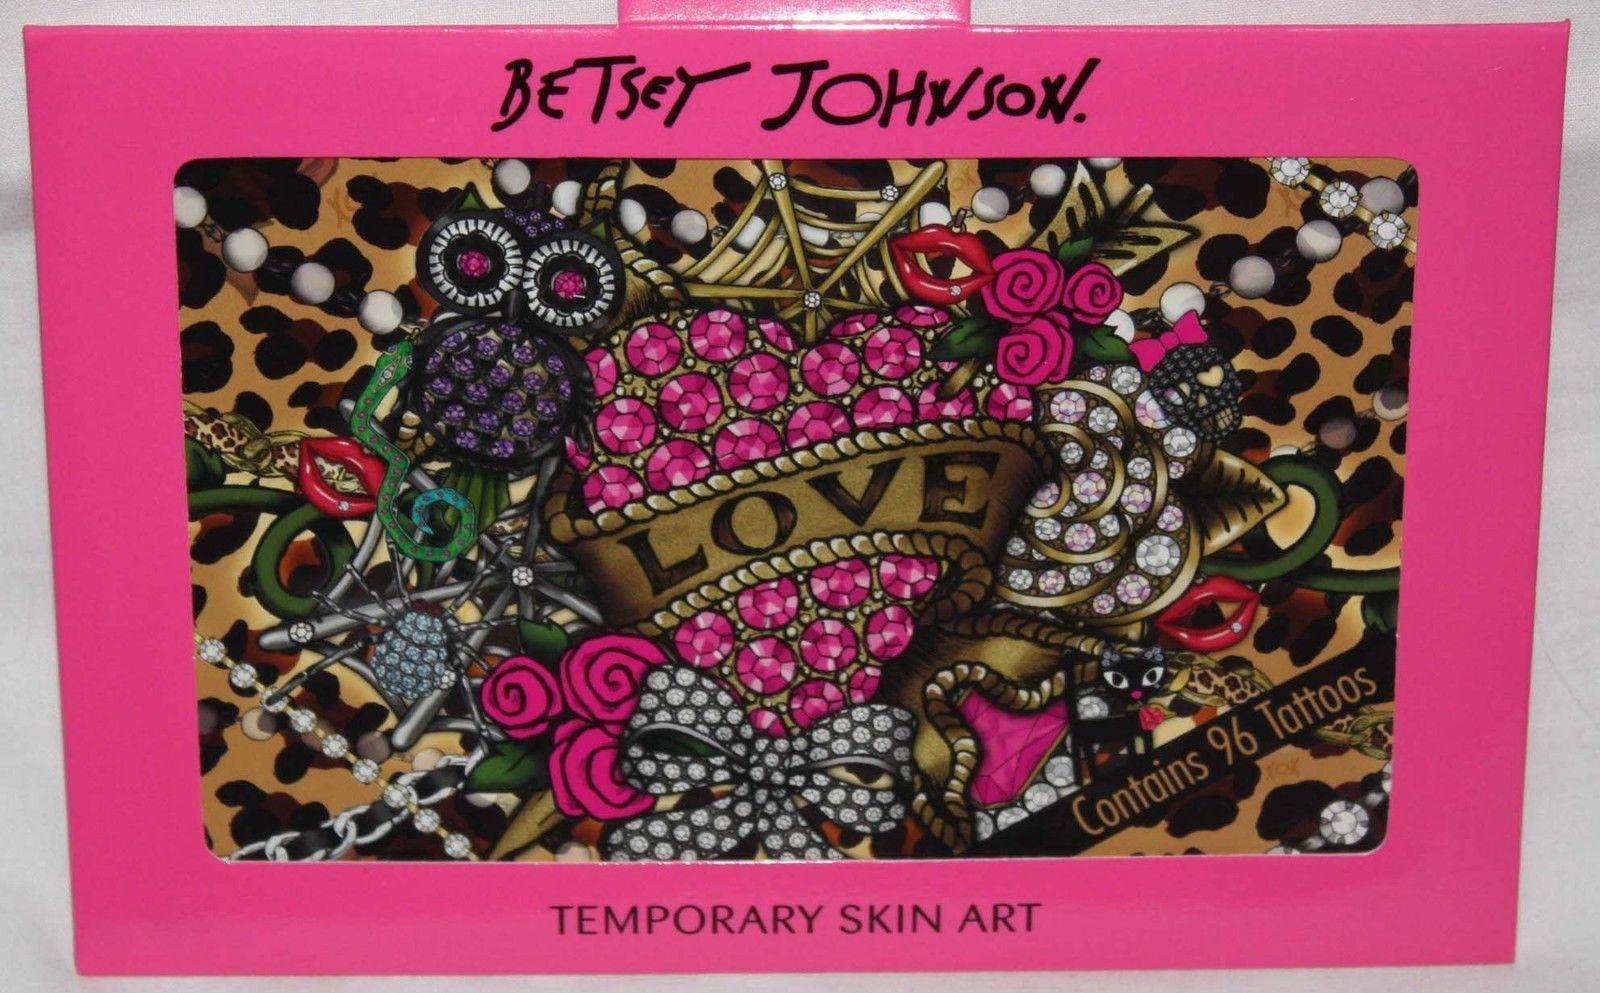 Betsey Johnson TEMPORARY Skin Art Tattoos* Roses, Skulls, Lips, Hearts & More 13560